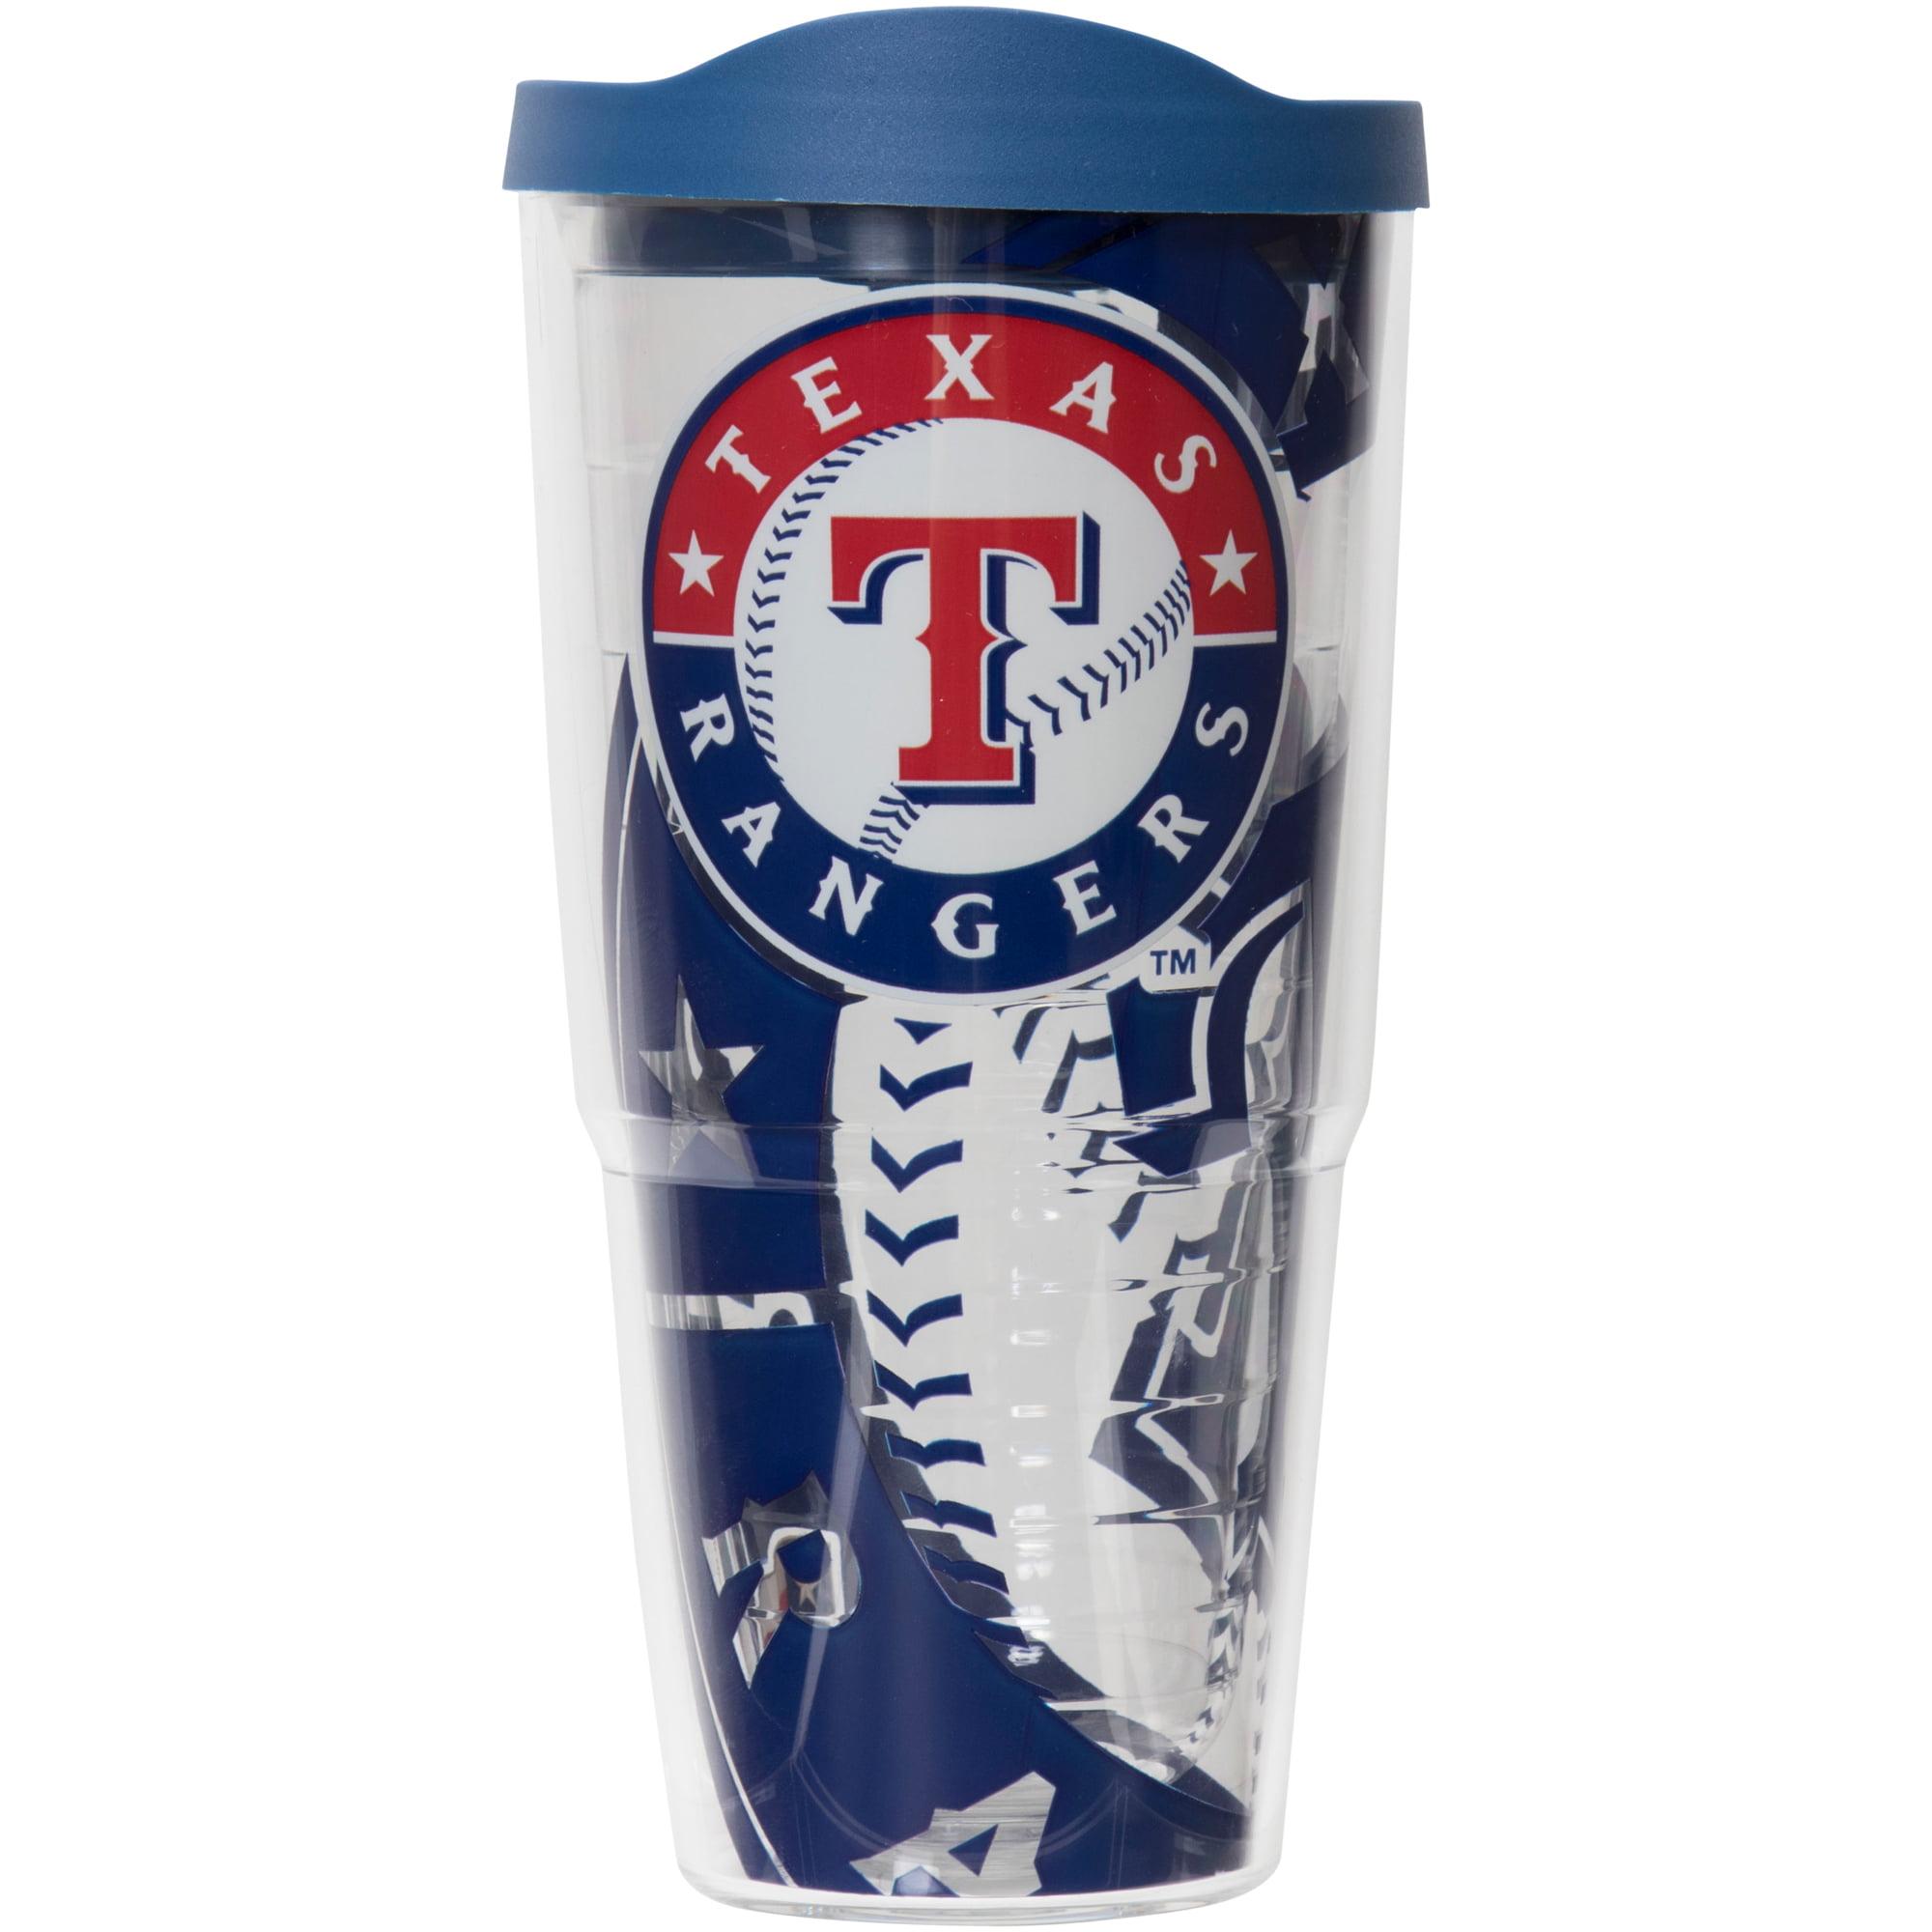 MLB Texas Rangers Genuine 24 oz Tumbler with lid